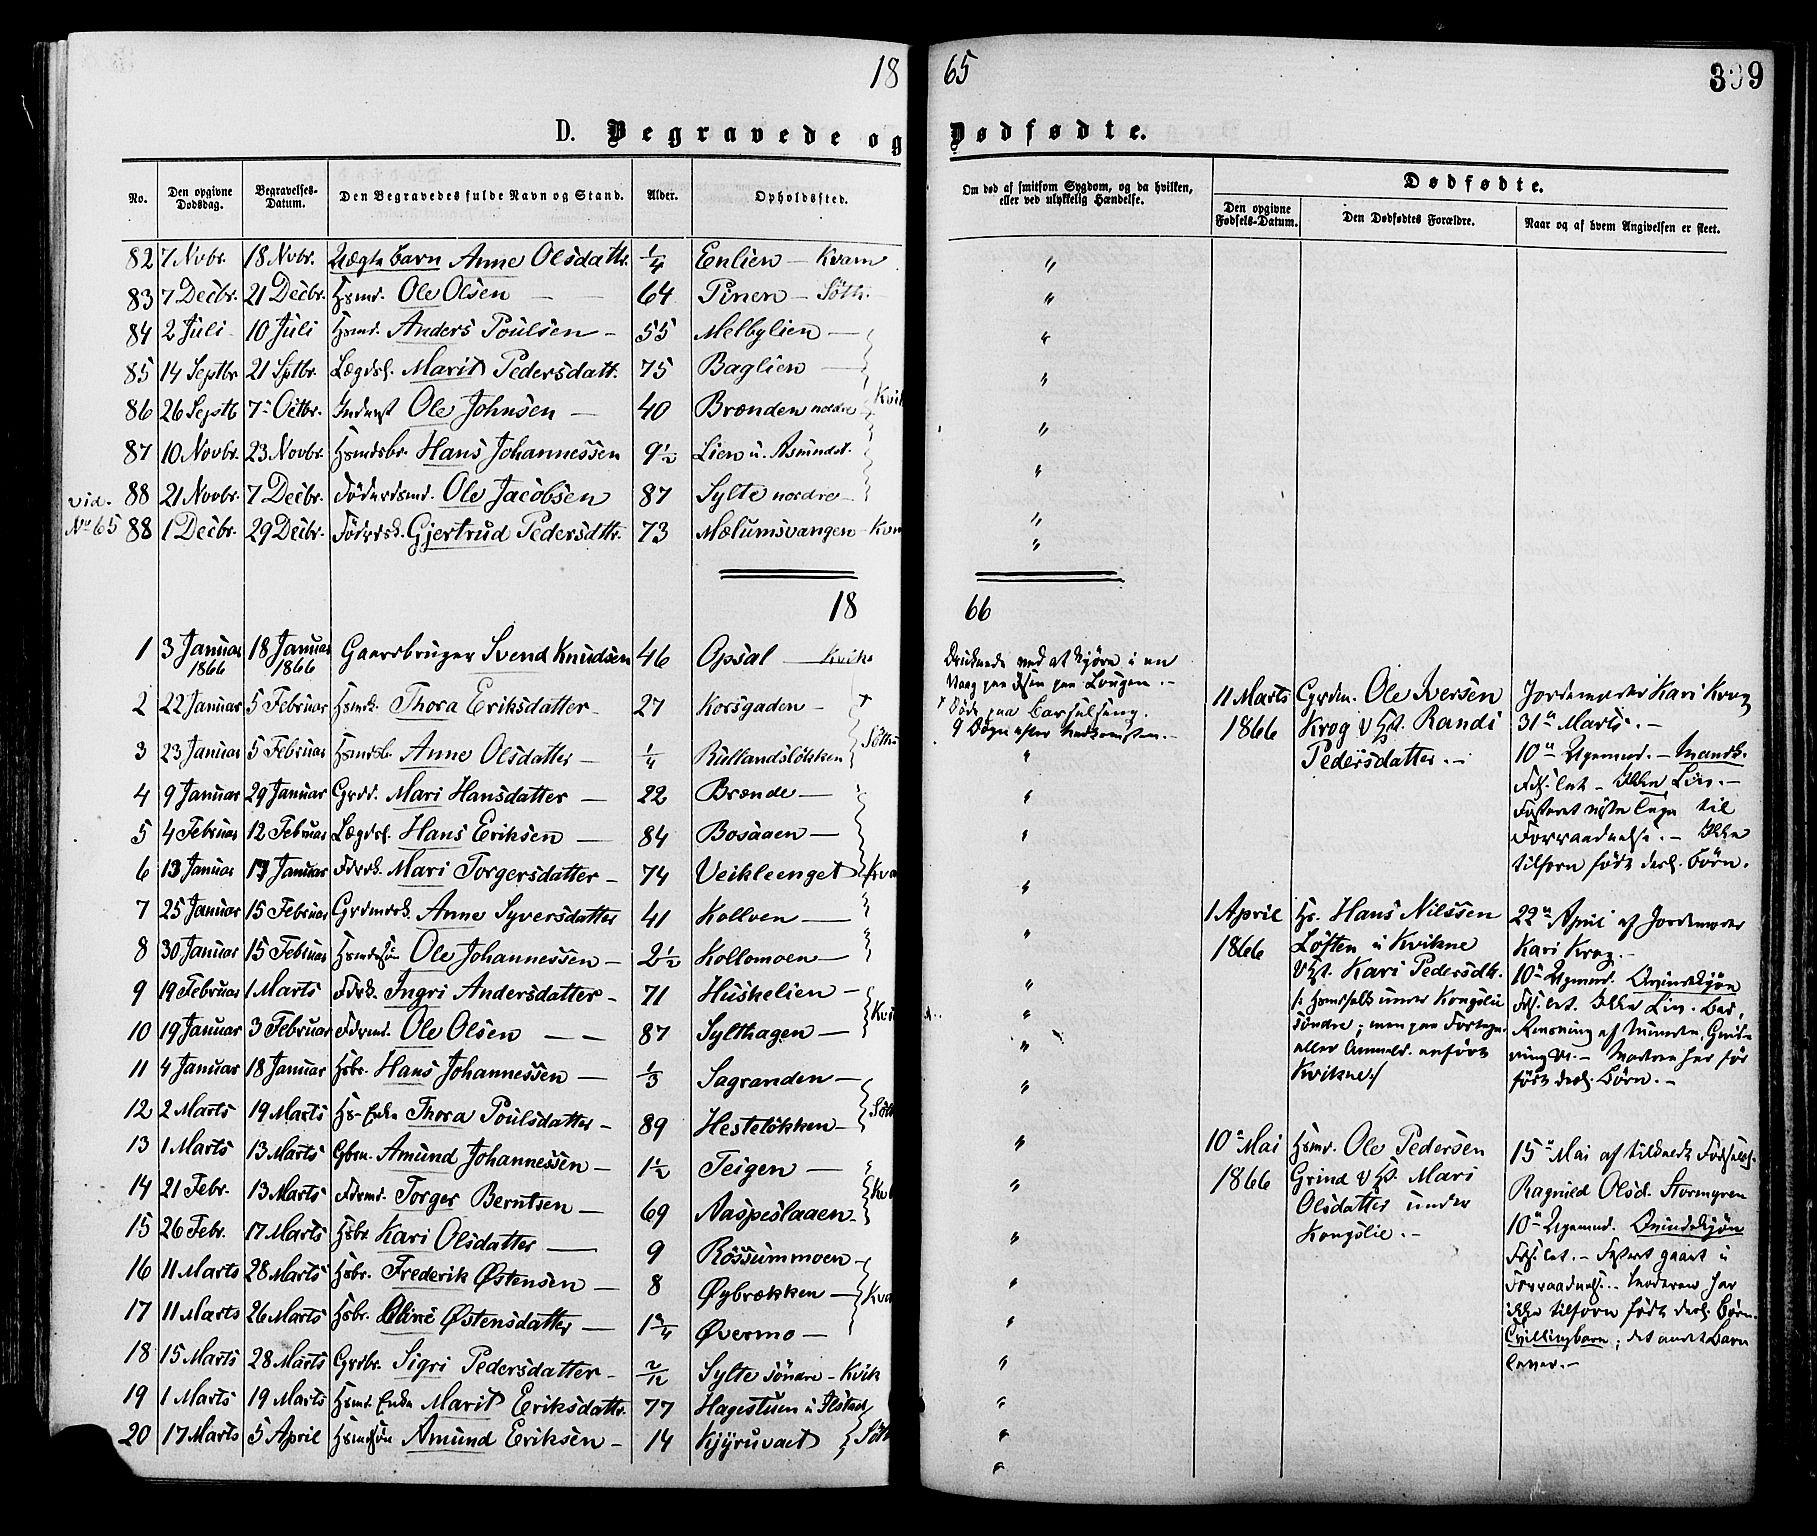 SAH, Nord-Fron prestekontor, Ministerialbok nr. 2, 1865-1883, s. 399